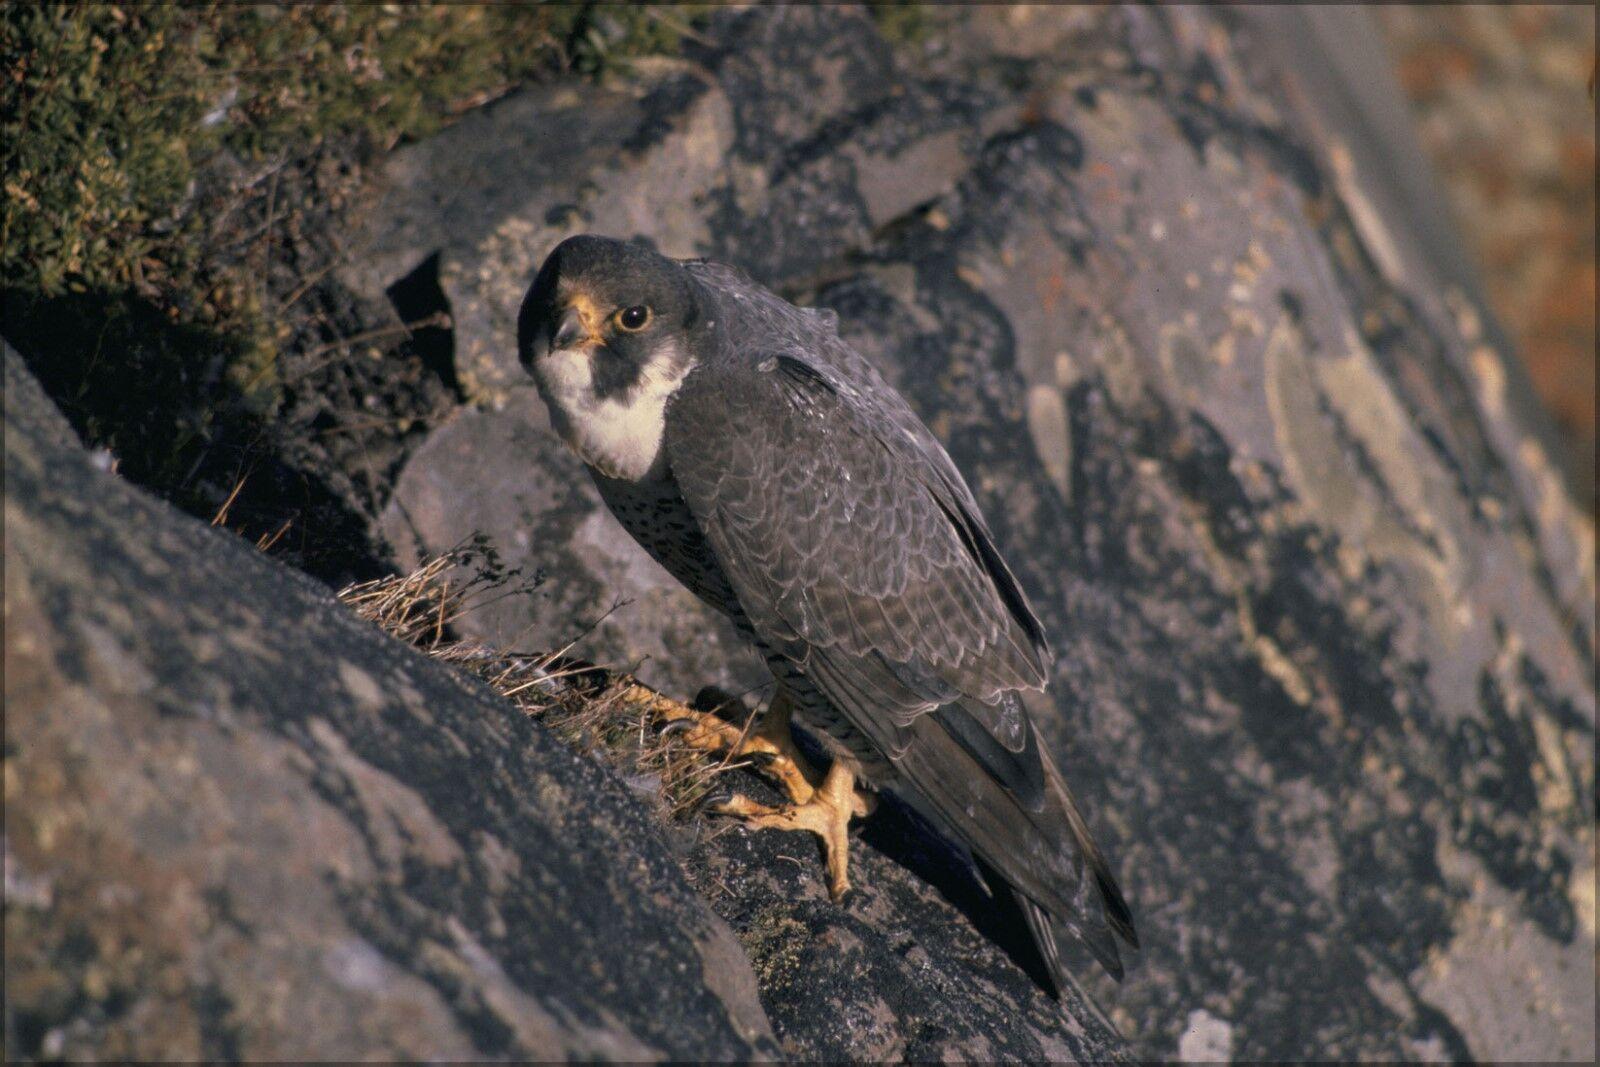 Poster, Many Größes; Falco Peregrinus Tundrius At Nest, Alaska